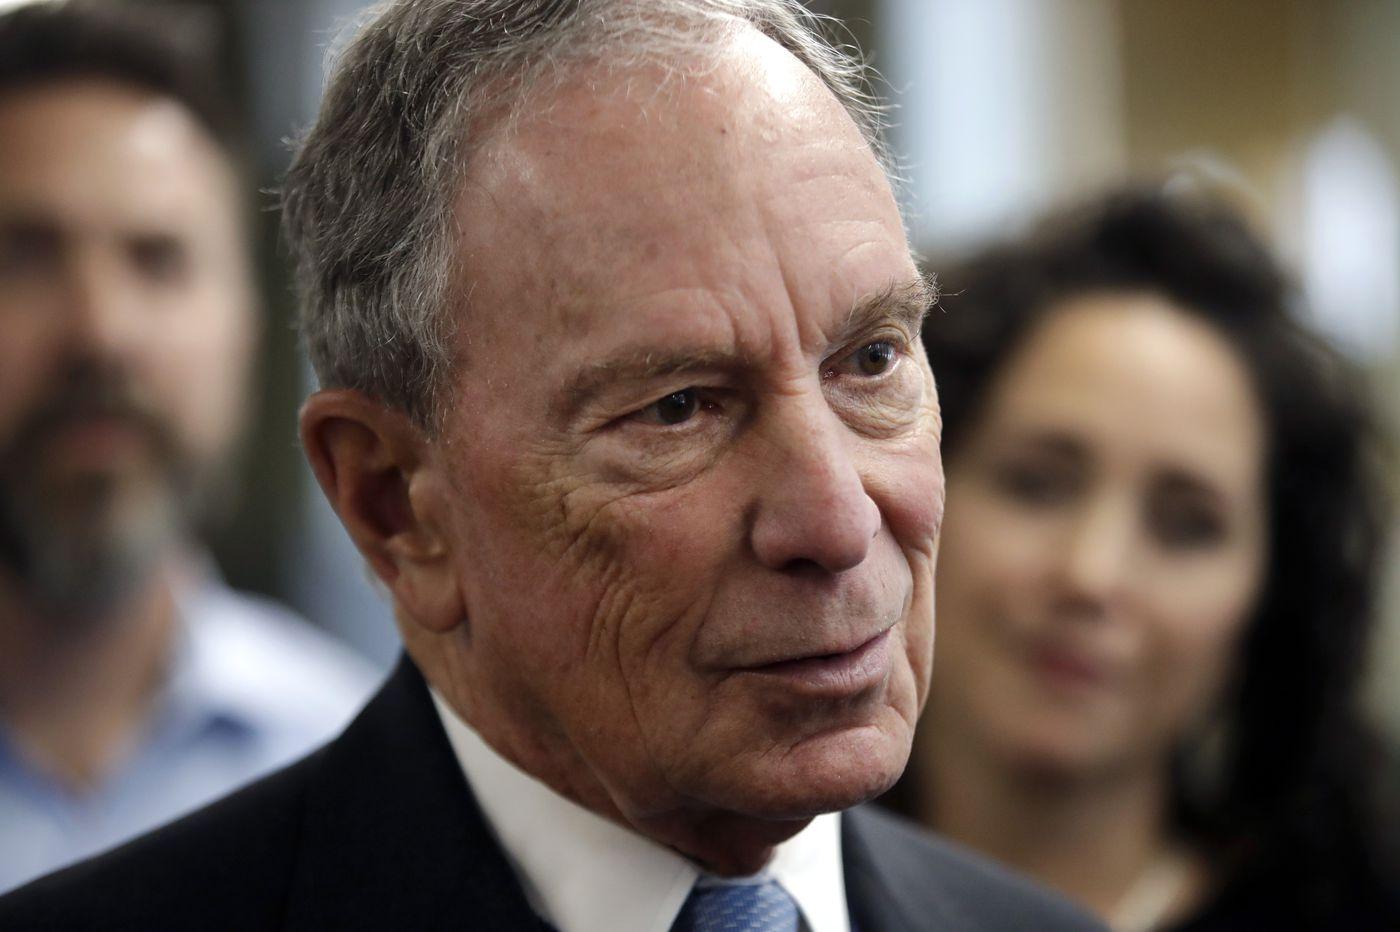 Michael Bloomberg considers run for president against Trump